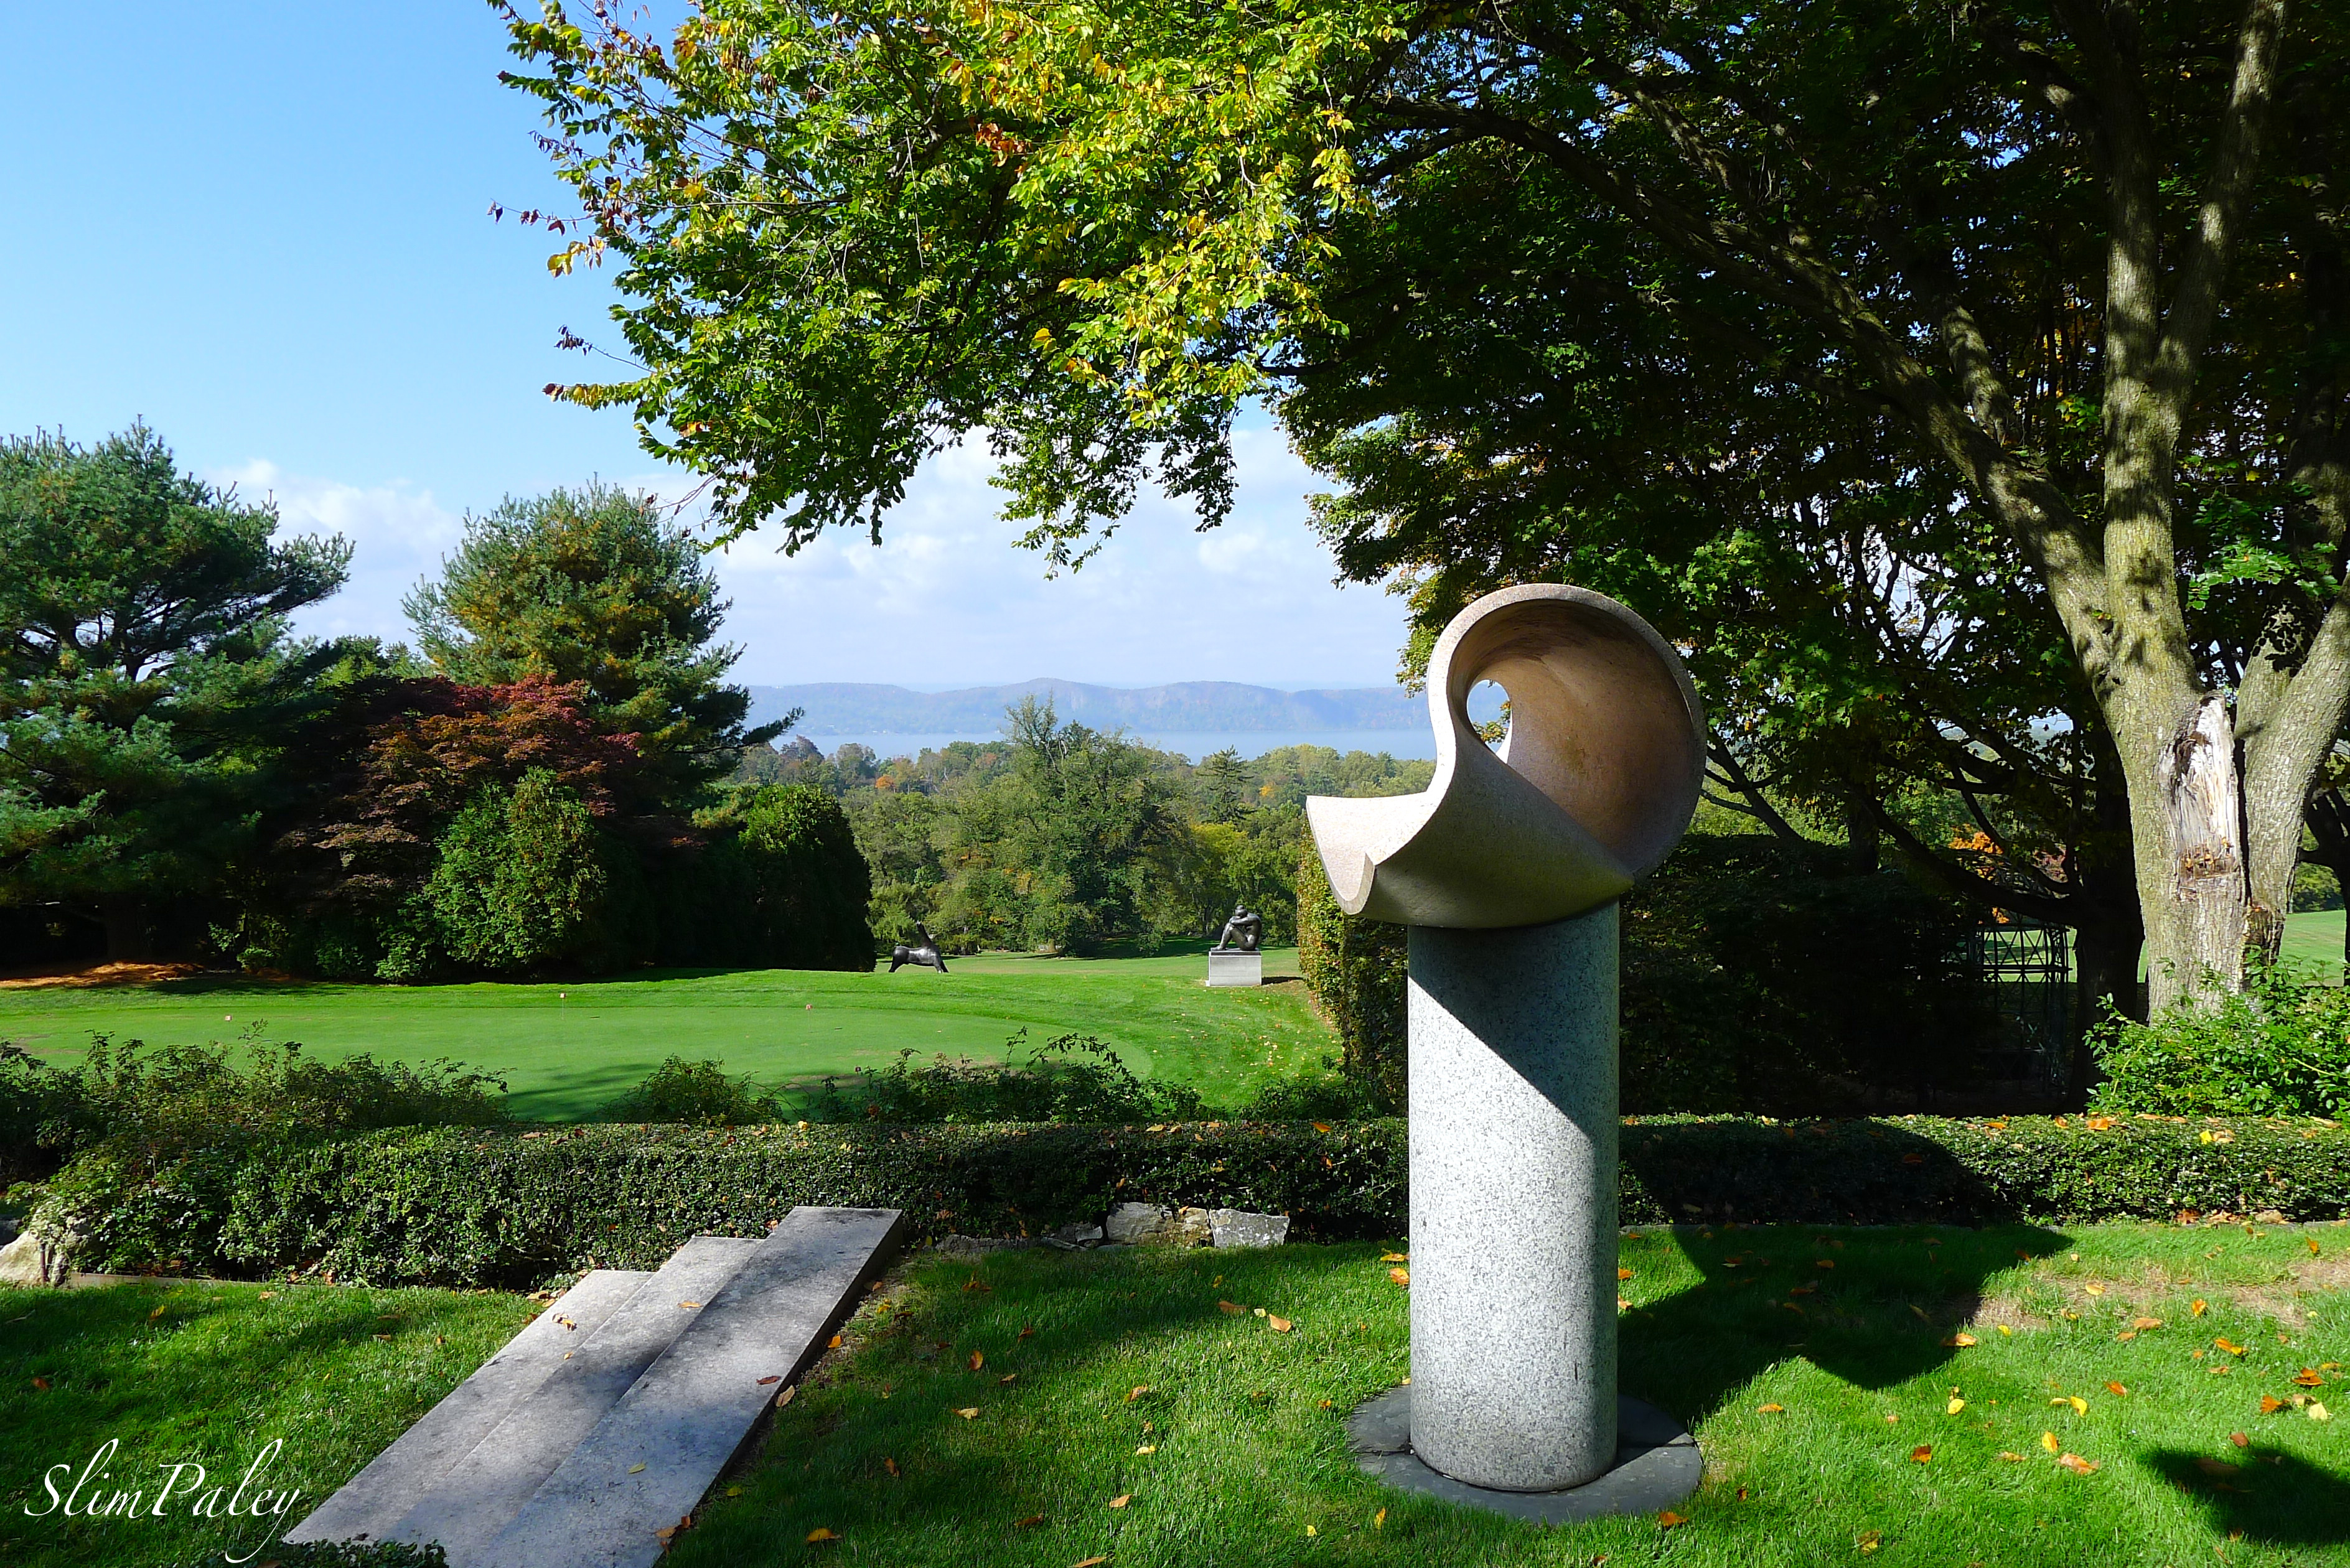 Kykuit Gardens, slimpaley.com